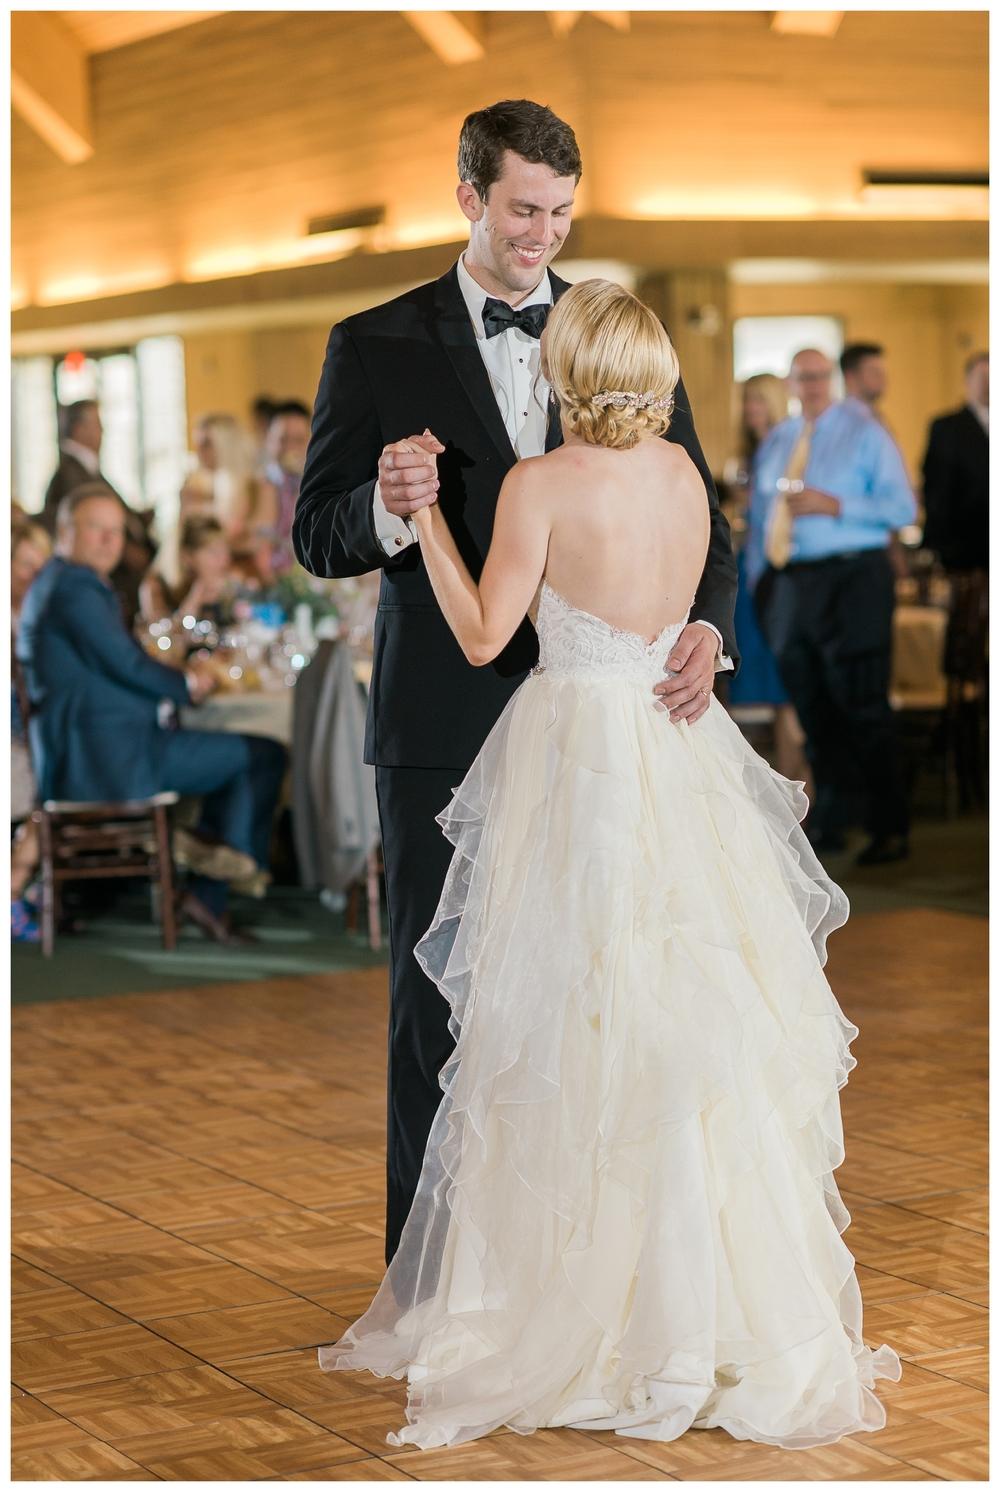 Rebecca_Bridges_Photography_Indianapolis_Wedding_Photographer_4586.jpg